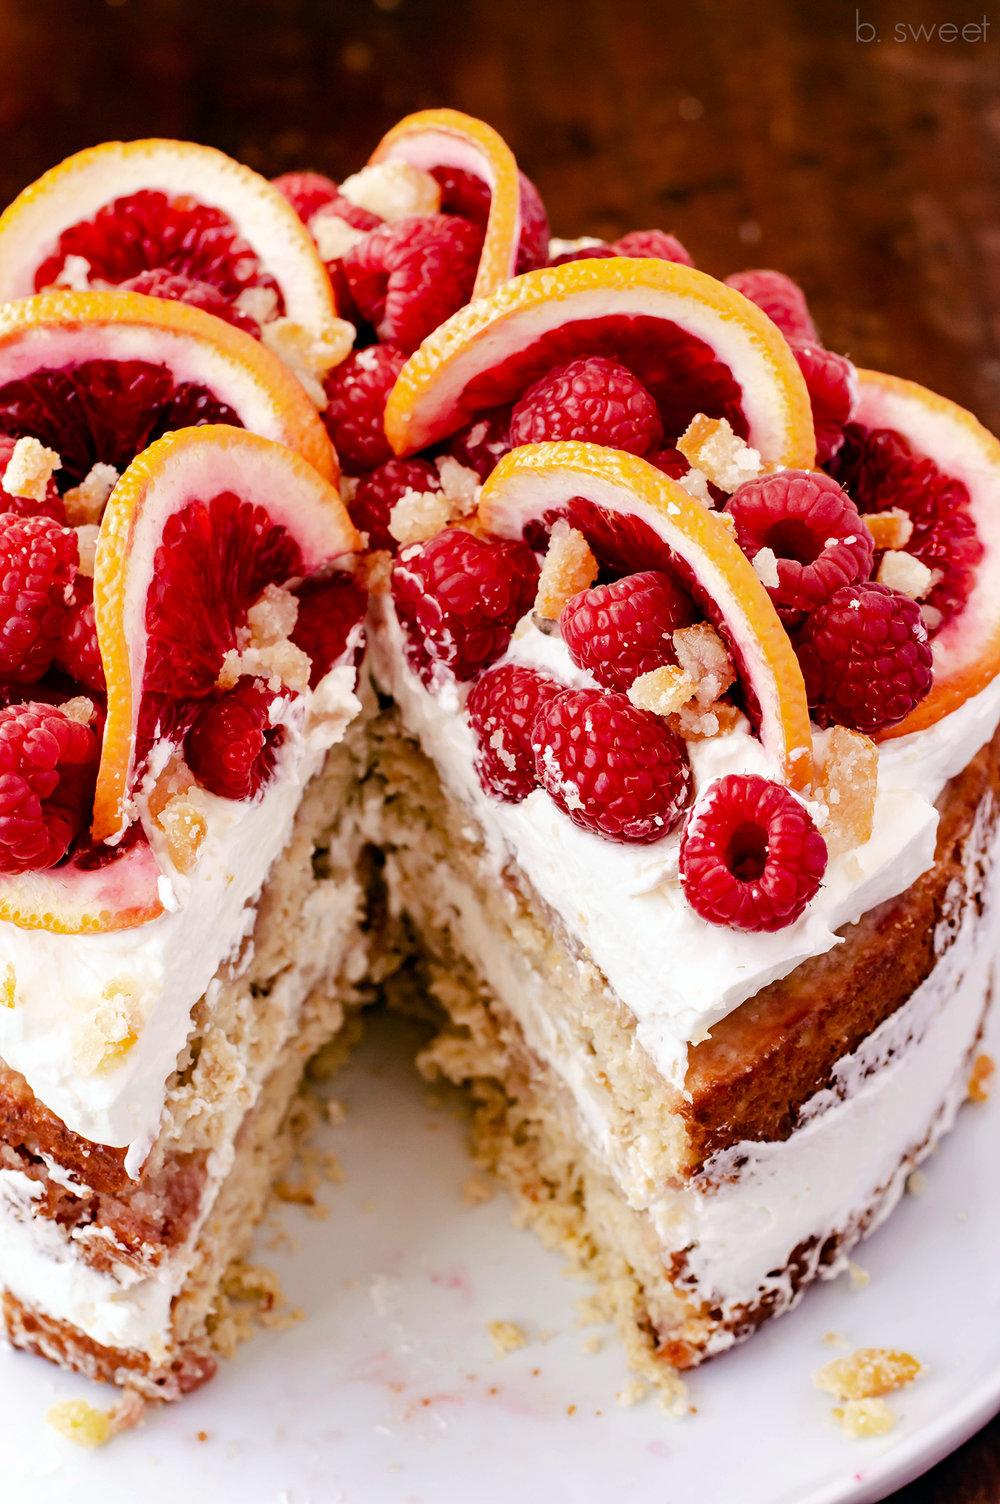 Whole Blood Orange Cake with Raspberries and Whipped Vanilla Bean Mascarpone  - b. sweet